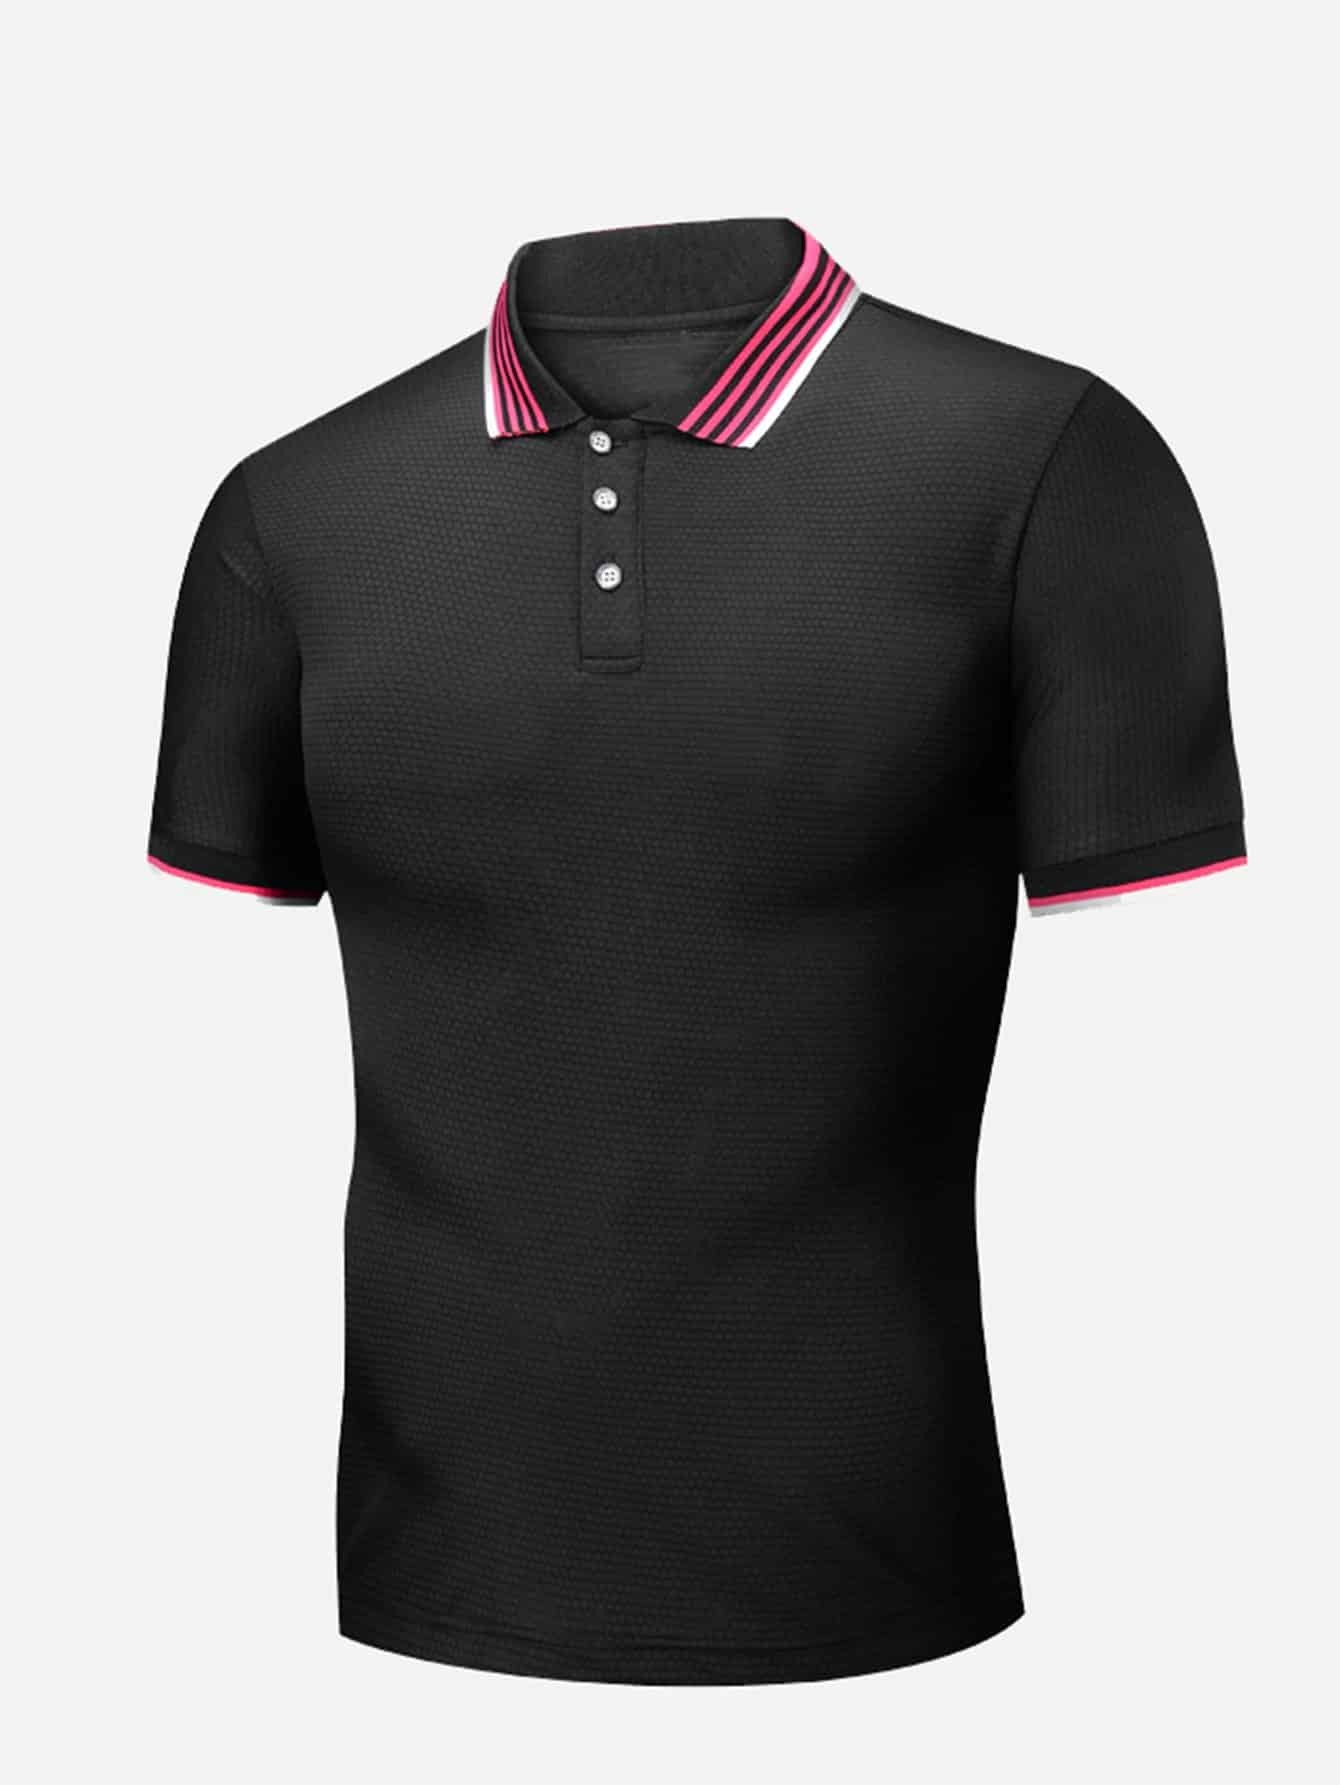 Men Striped Neck Polo Shirt men striped neck polo shirt